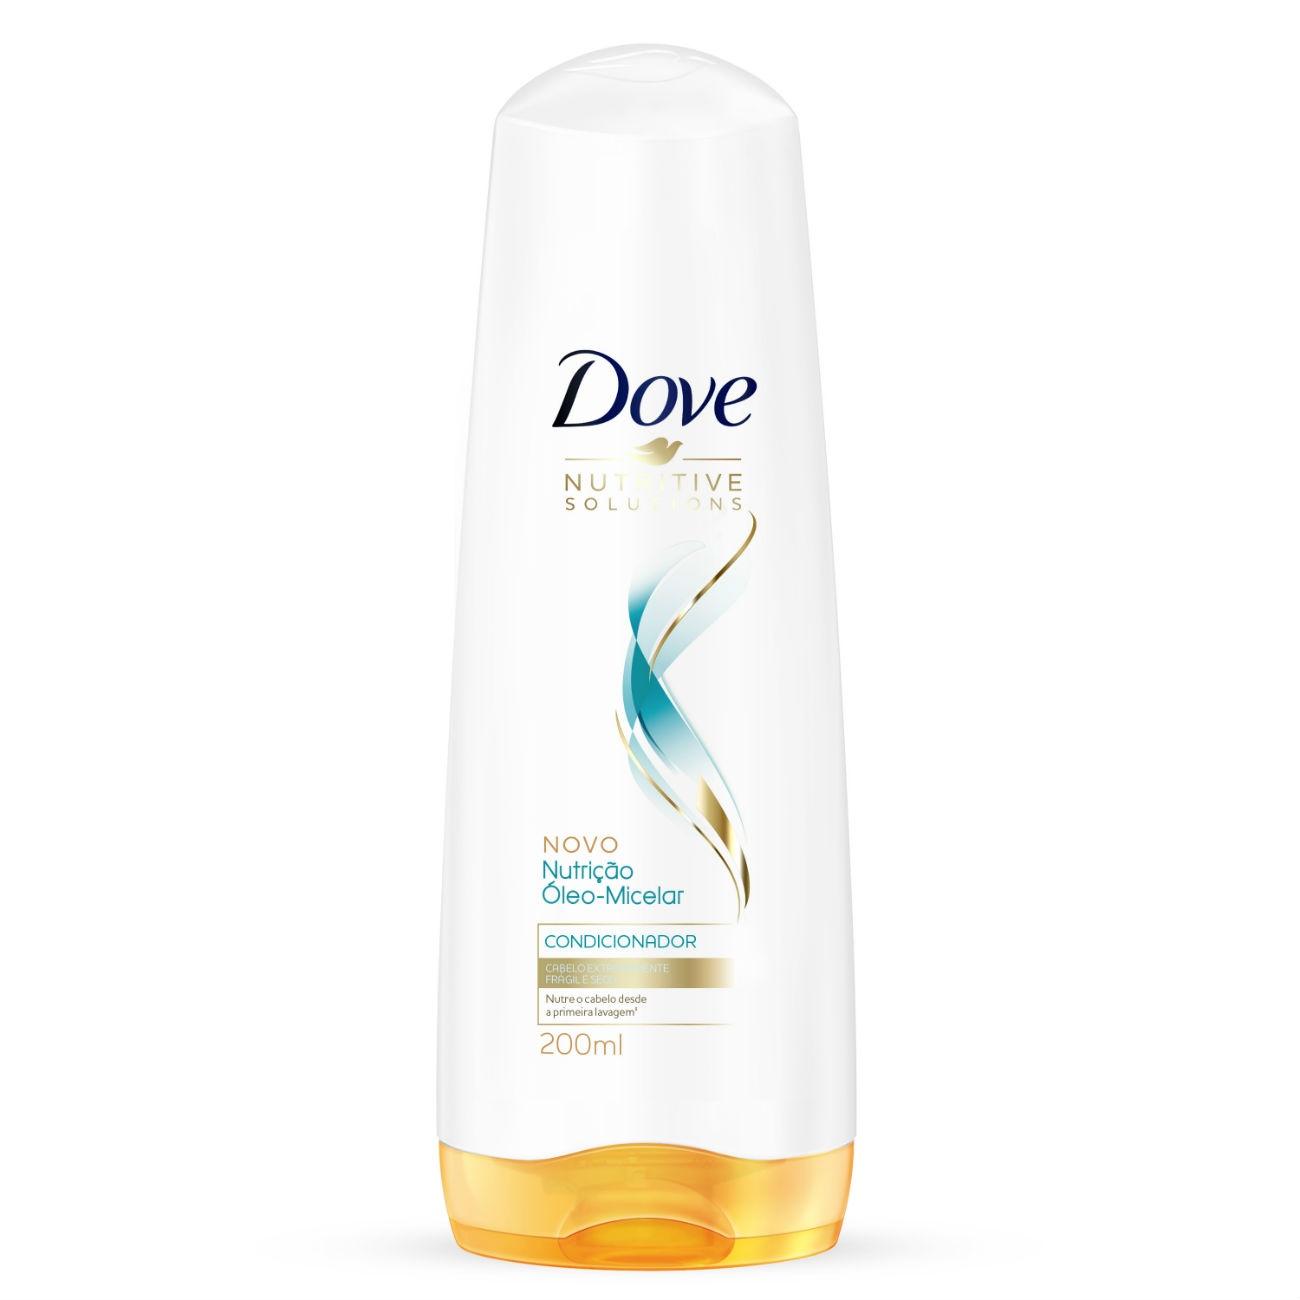 Condicionador Dove Nutri��o �leo-Micelar 200ml